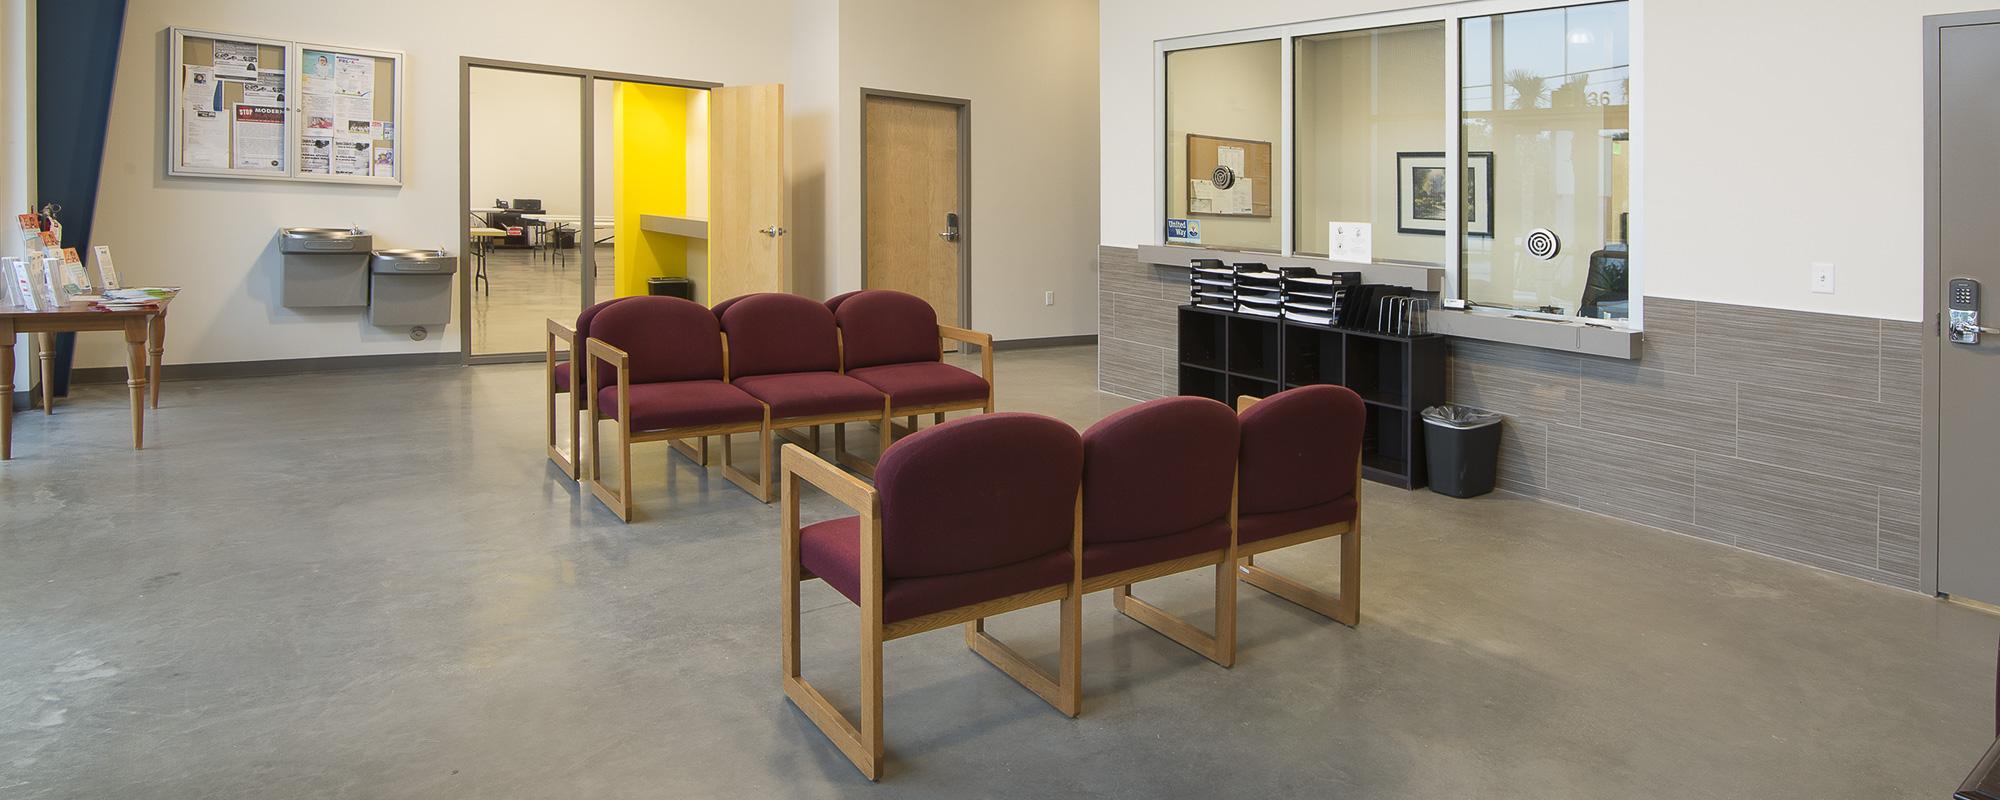 Legal Aid Renovation – Interior